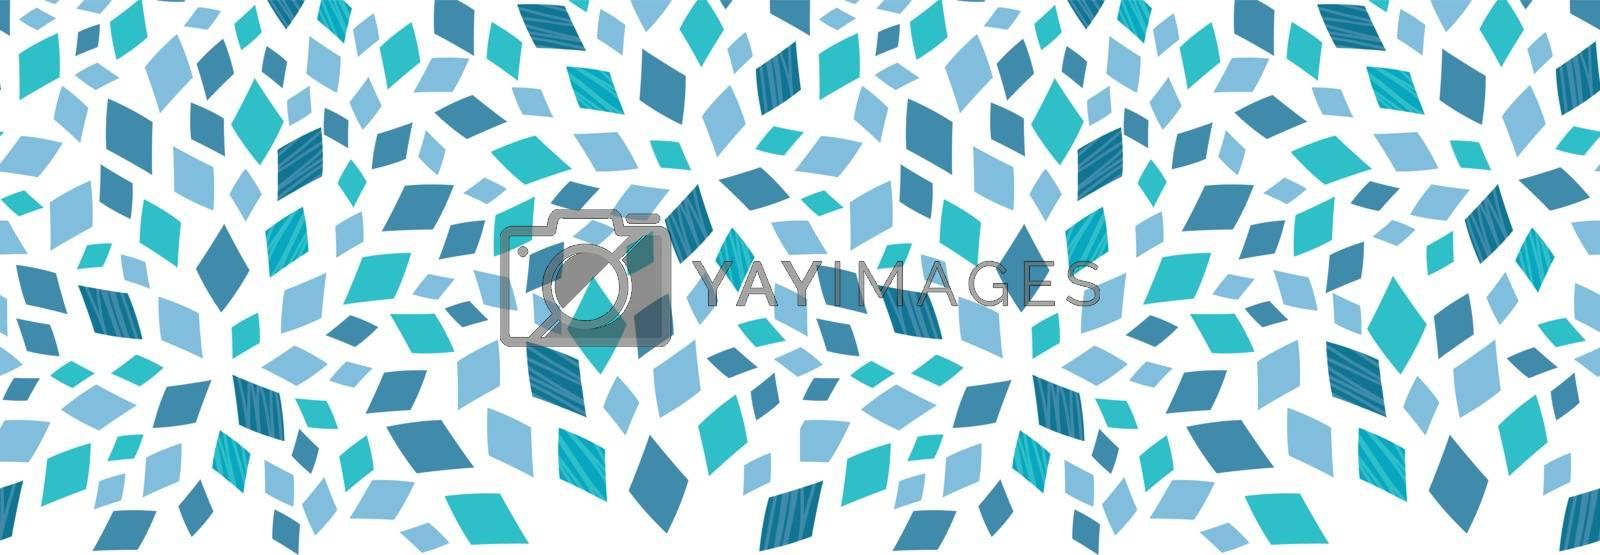 Vector blue mosaic texture horizontal border seamless pattern background graphic design